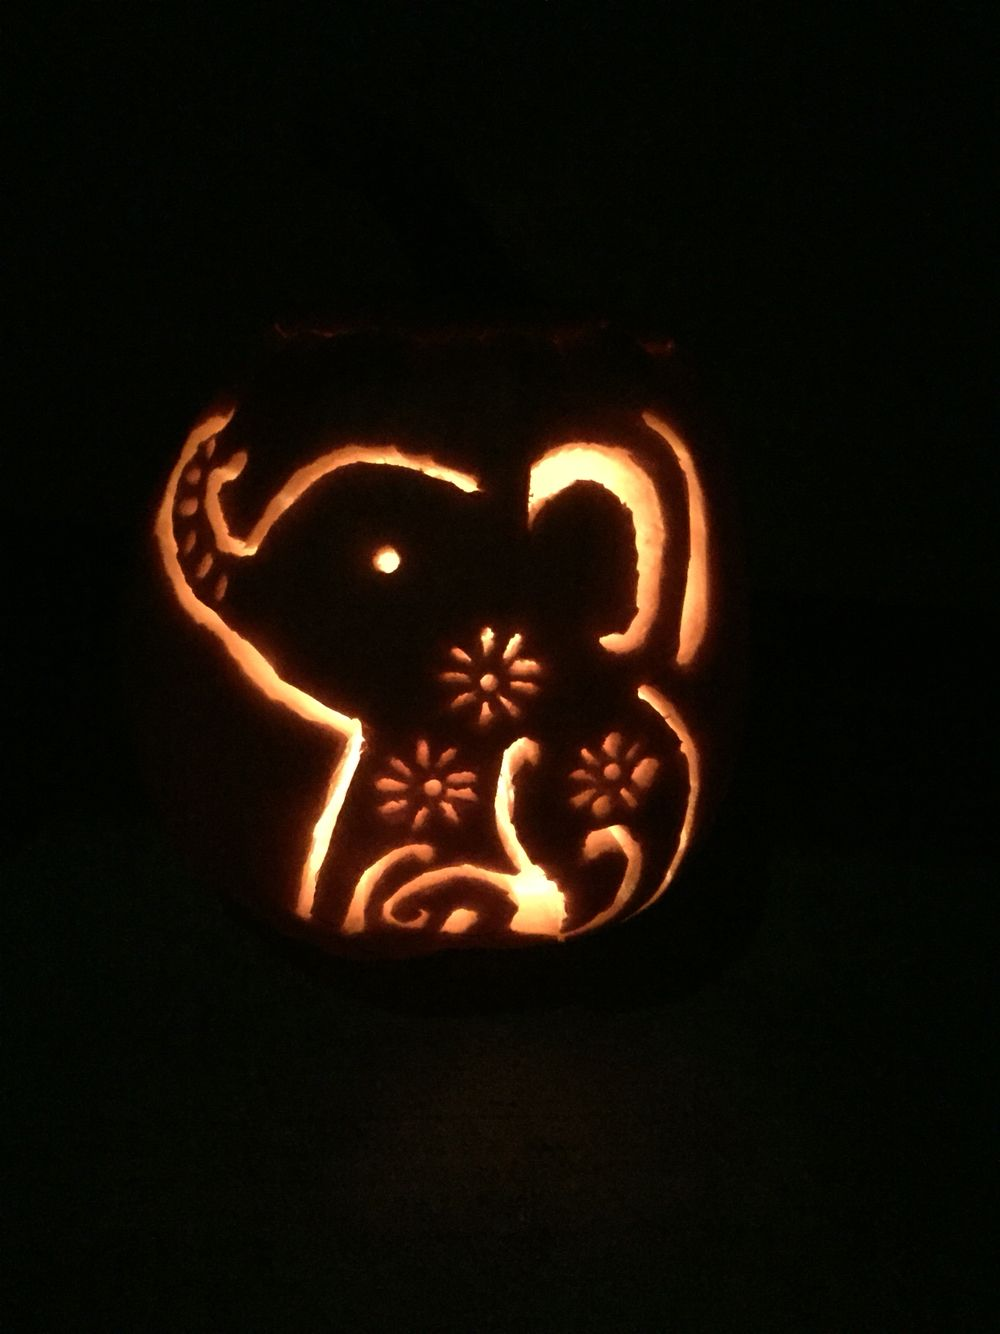 Cute Elephant Pumpkin Carving · Pumpkin Carving Ideas Diy Halloween2016 ...